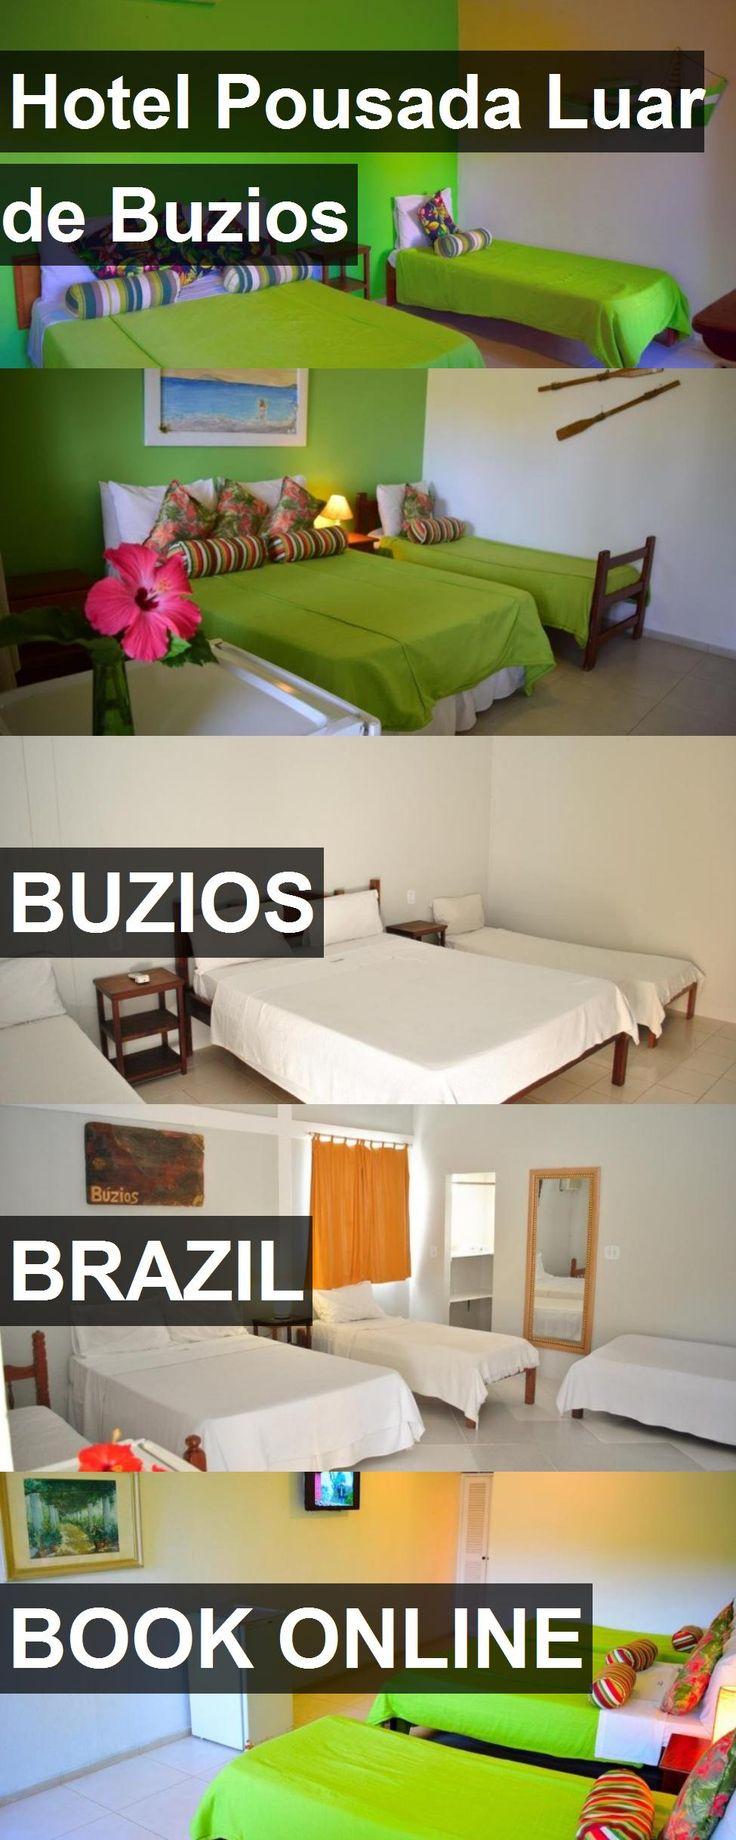 Hotel Hotel Pousada Luar de Buzios in Buzios, Brazil. For more information, photos, reviews and best prices please follow the link. #Brazil #Buzios #HotelPousadaLuardeBuzios #hotel #travel #vacation